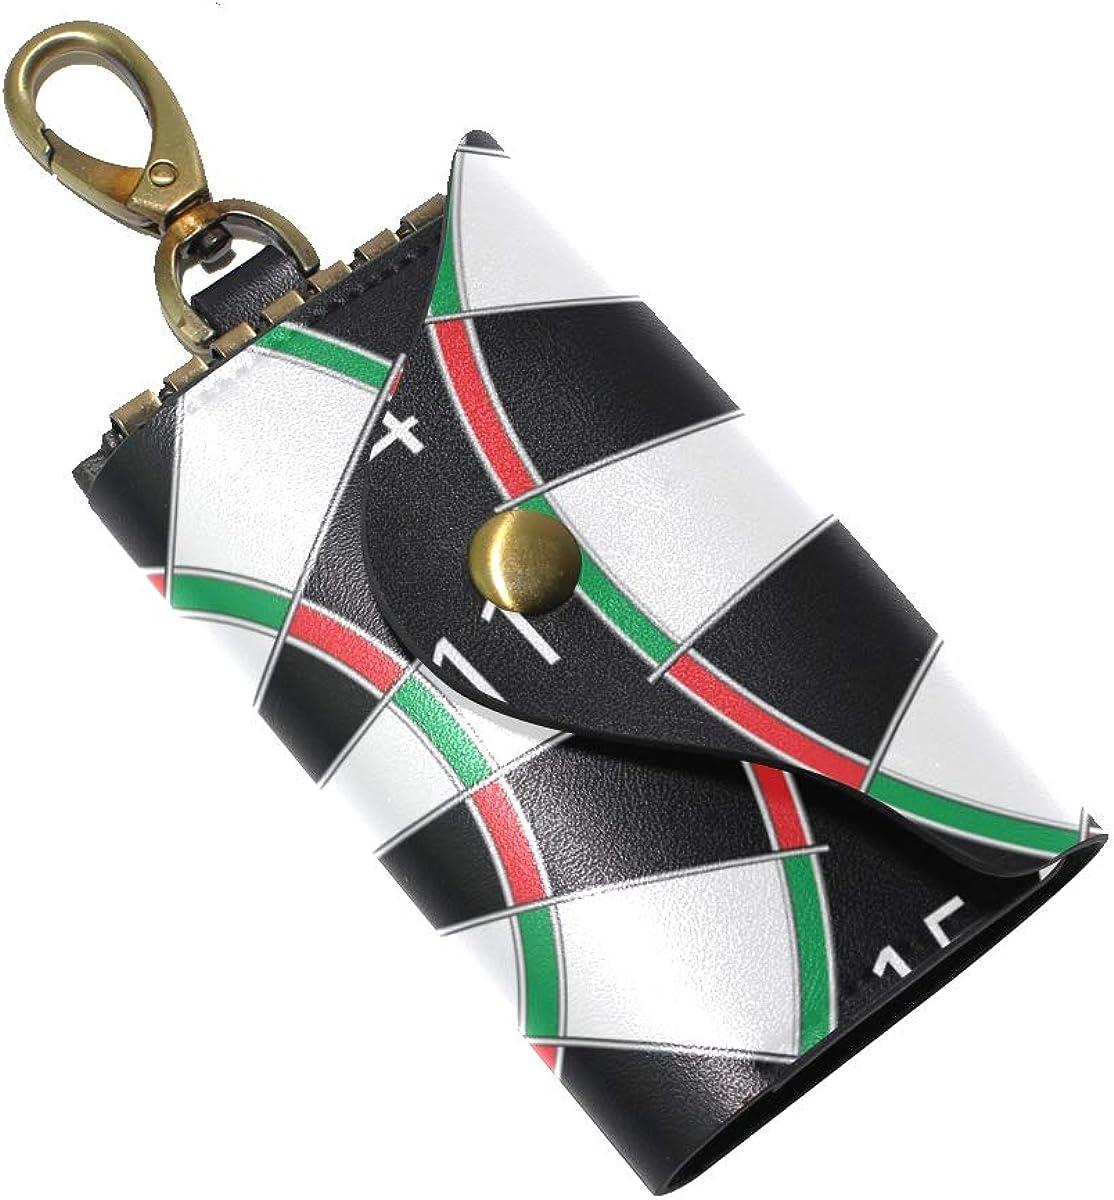 KEAKIA Dartsboard Leather Key Case Wallets Tri-fold Key Holder Keychains with 6 Hooks 2 Slot Snap Closure for Men Women